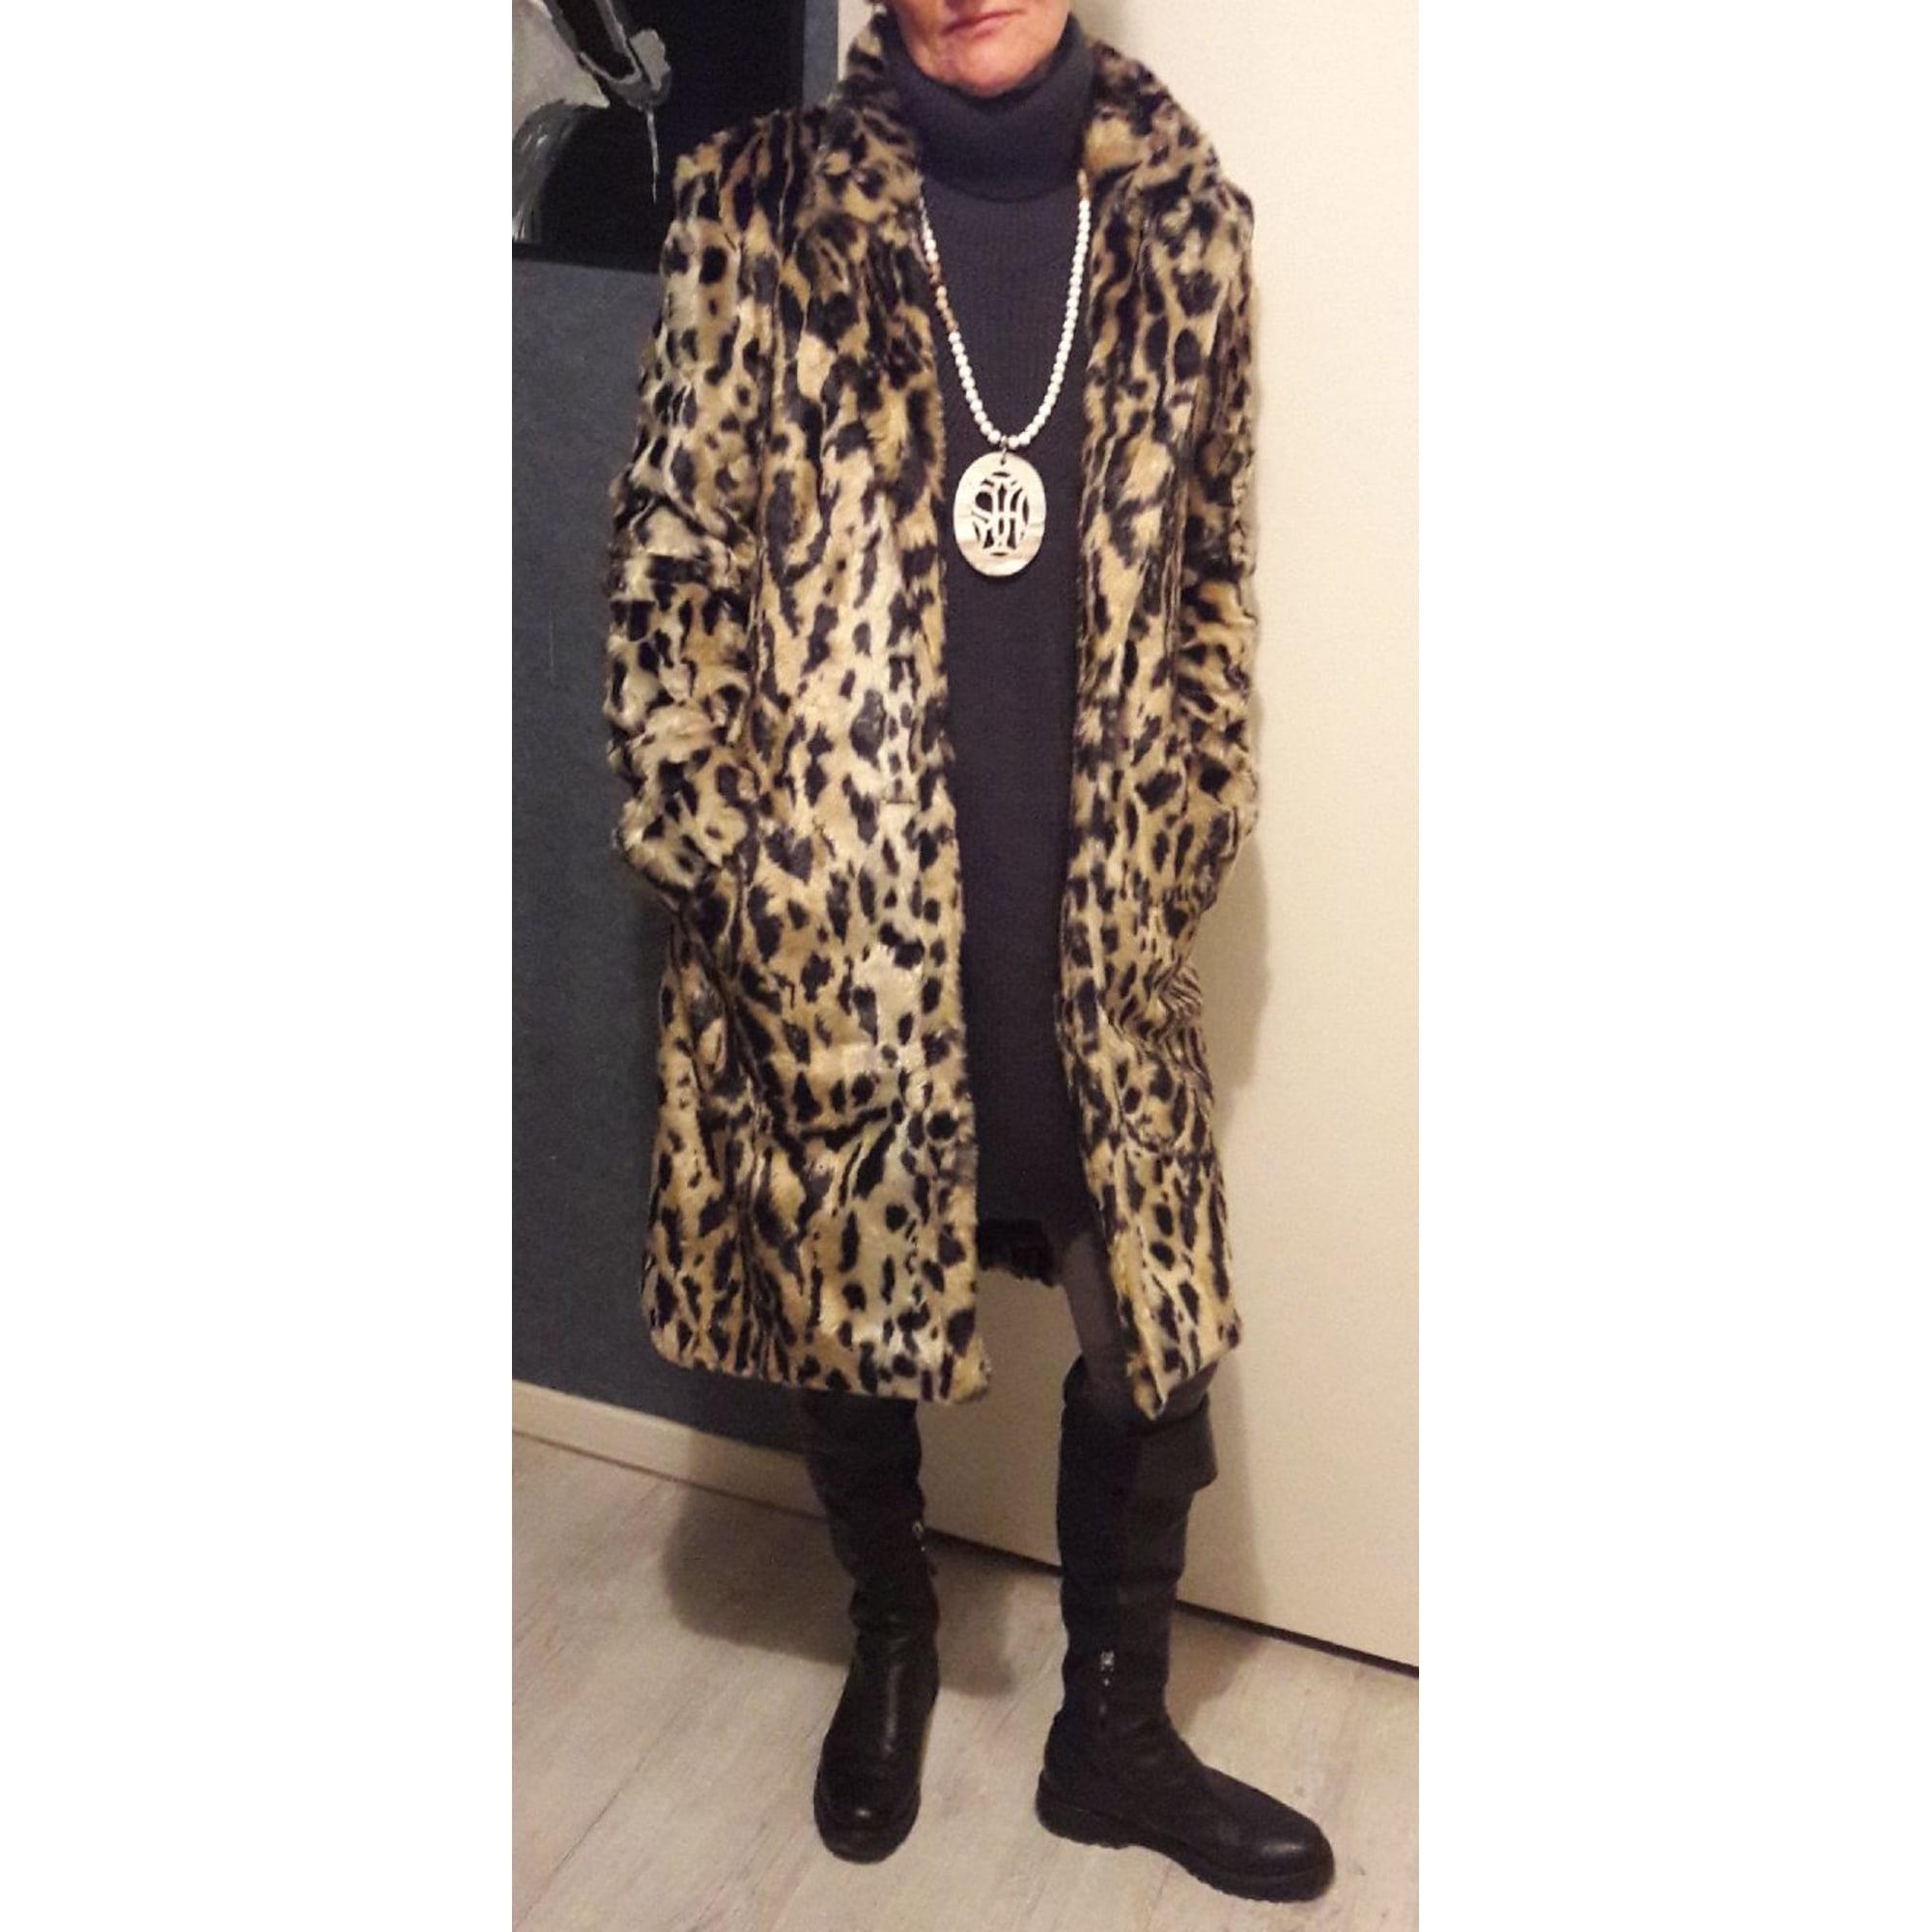 Manteau NOT SHY Imprimés animaliers